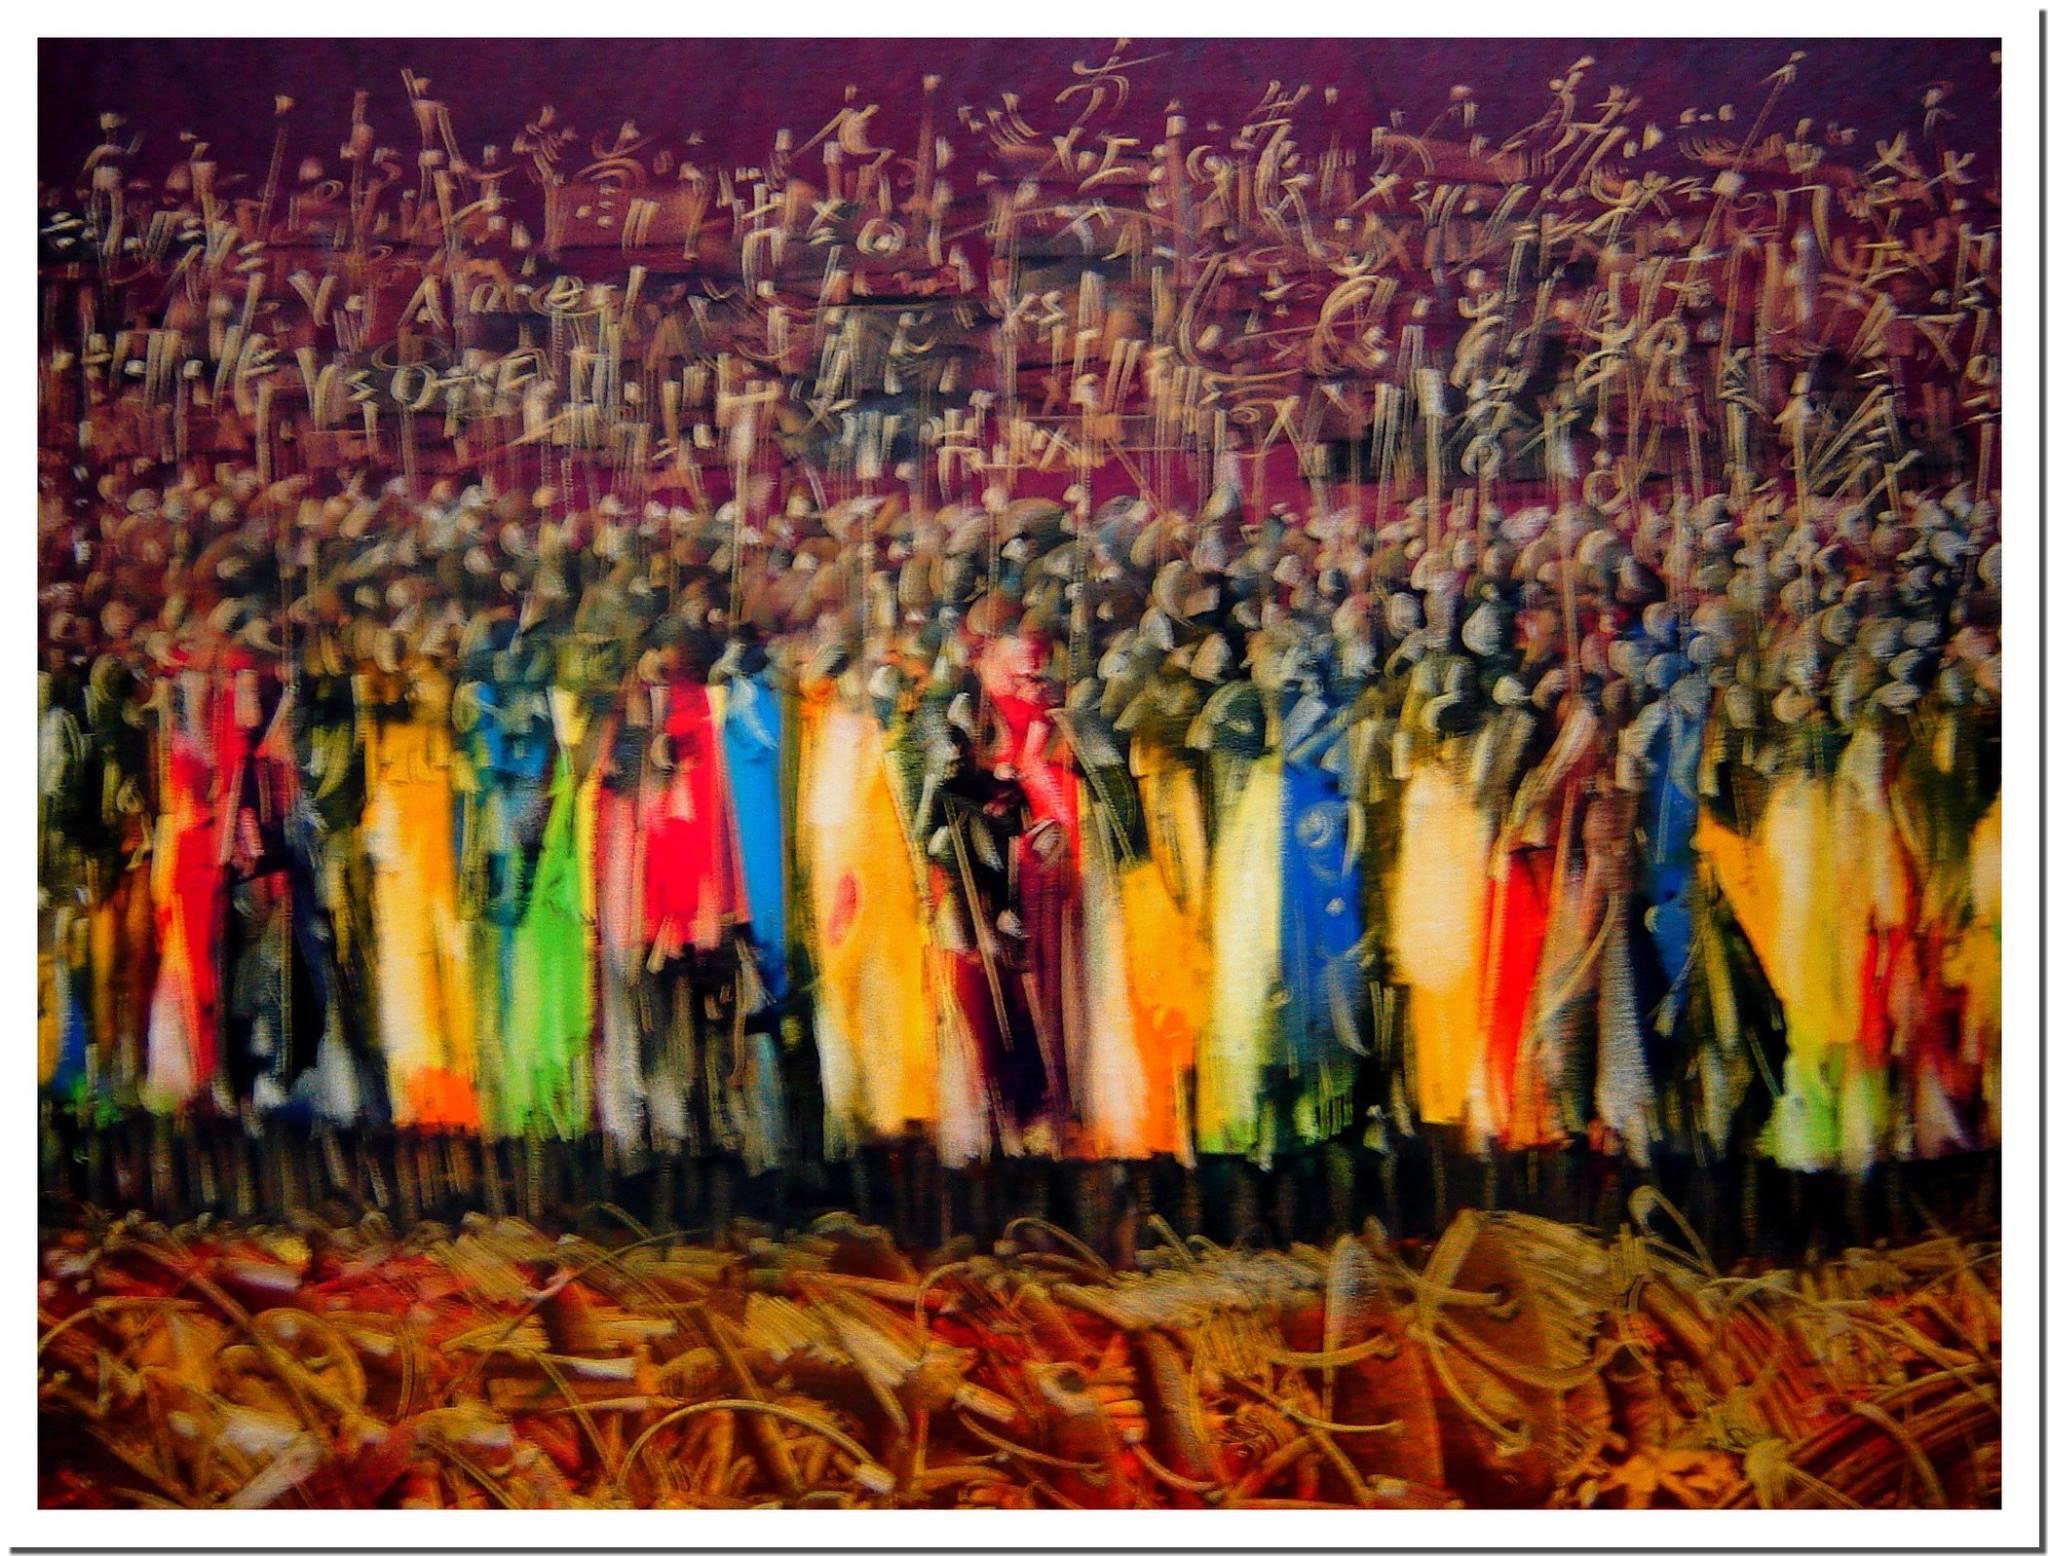 Oeuvre de Hassane Amraoui